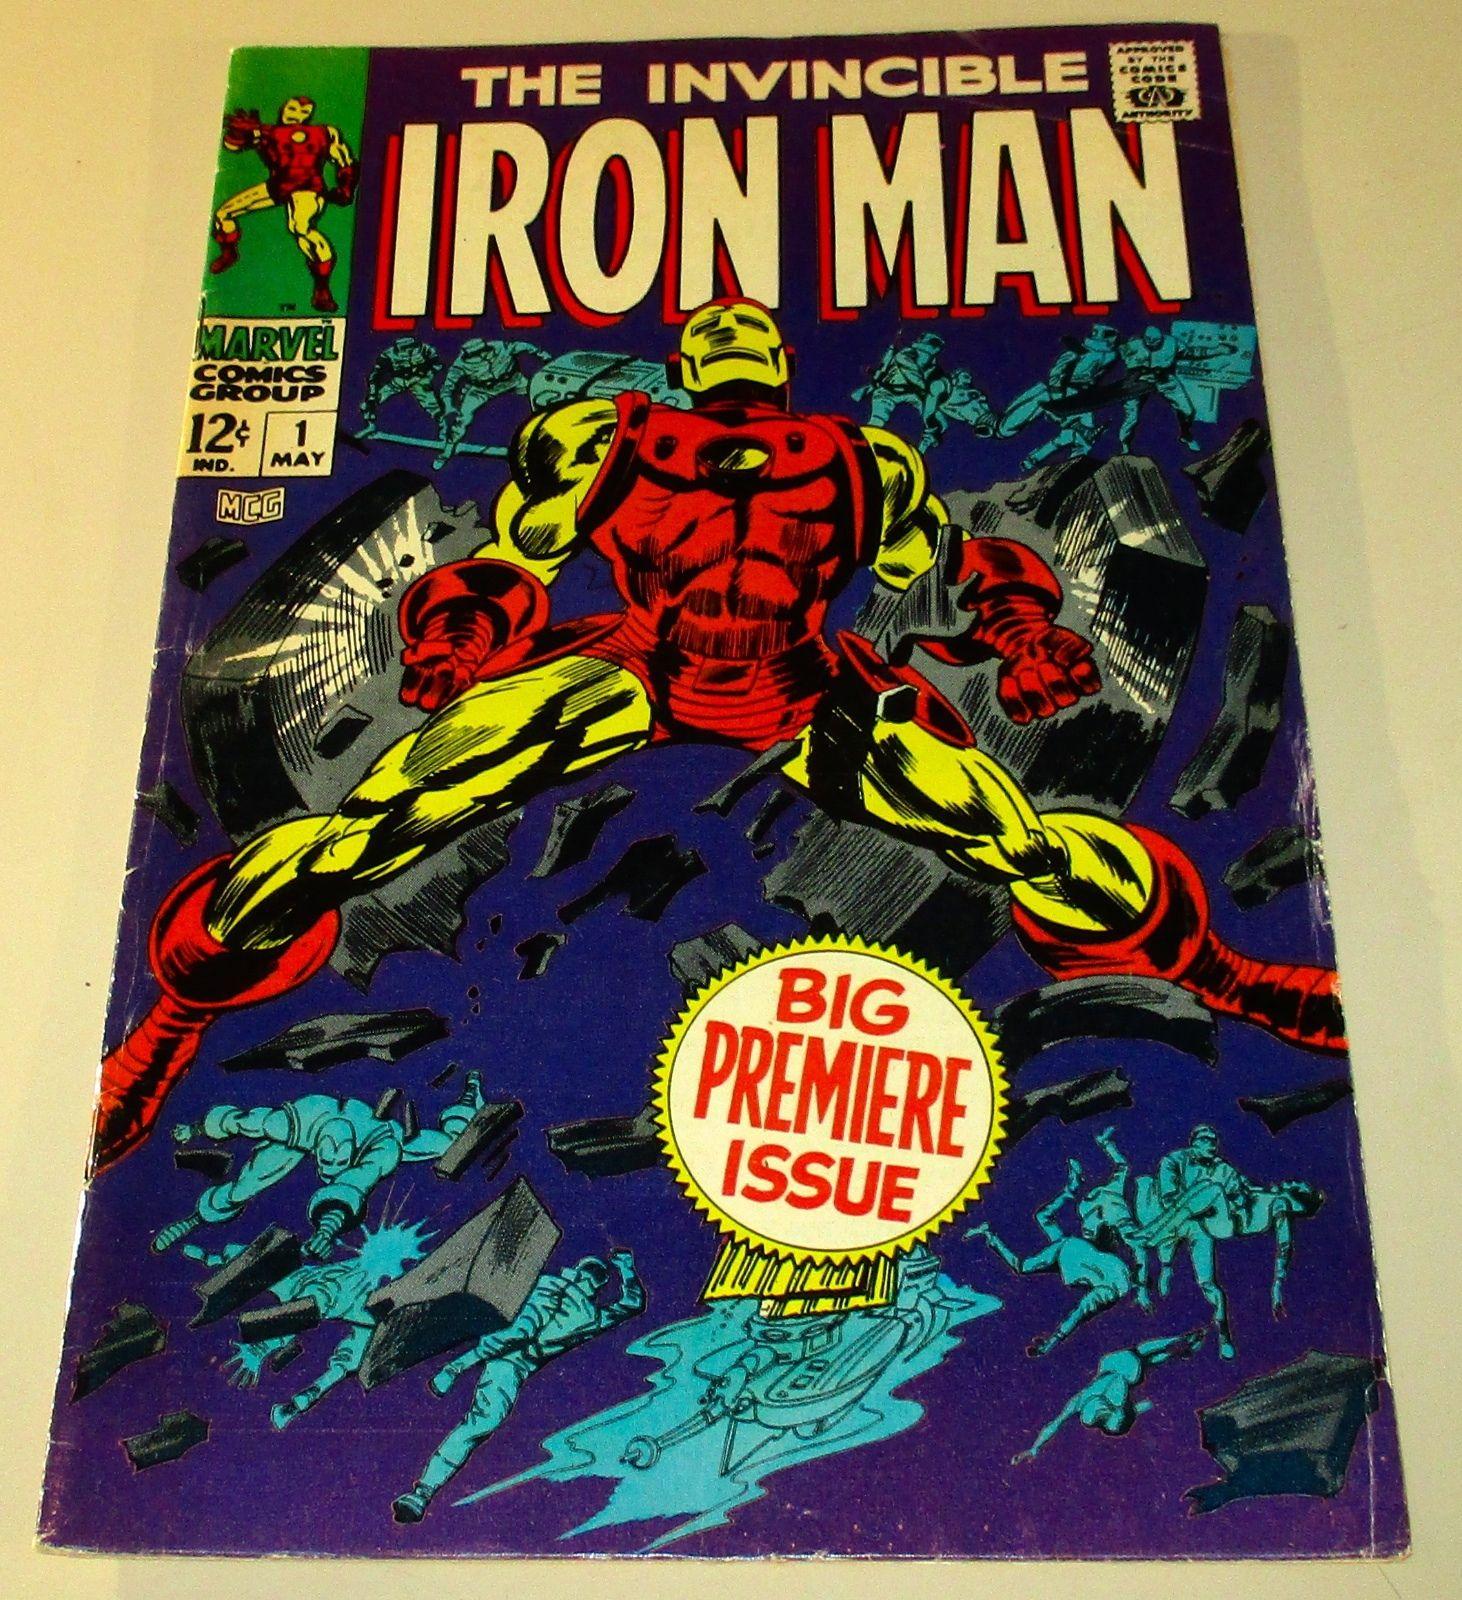 100) Iron Man # 1, 1968, app. grade: FN/VFN 7.0